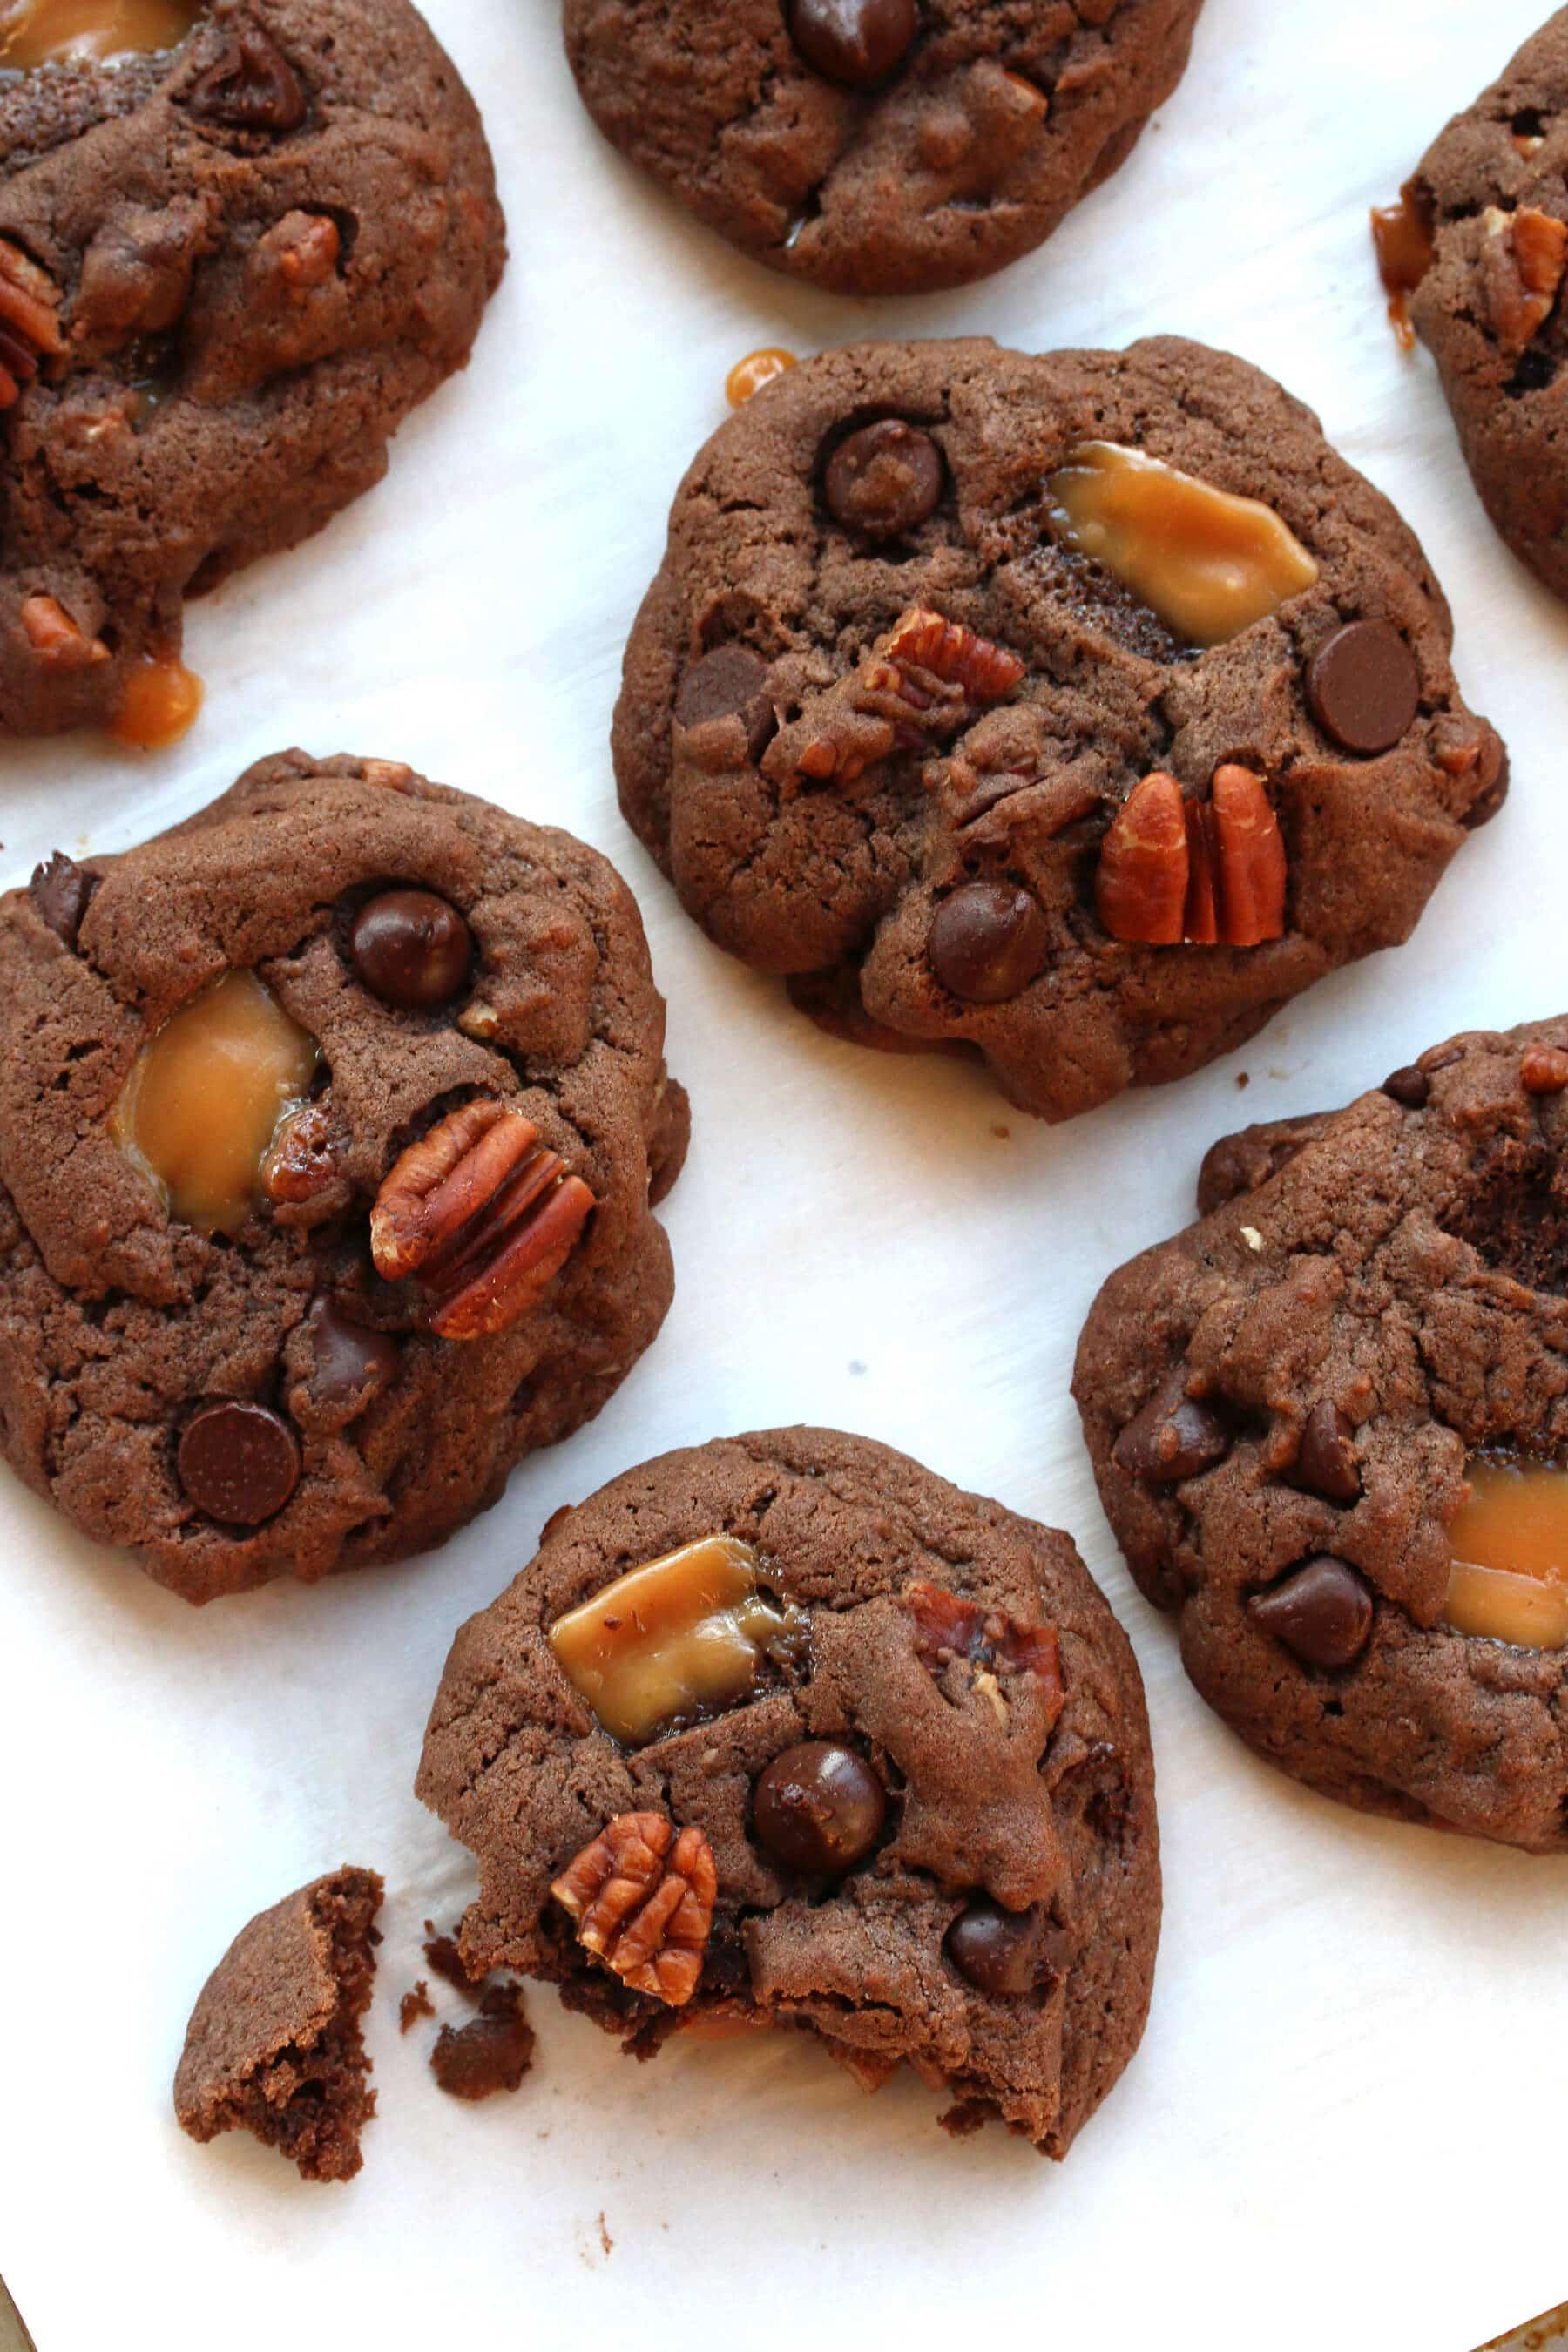 Mexican Chocolate Caramel Pecan Cookies (Turtle Cookies) - The Daring ...